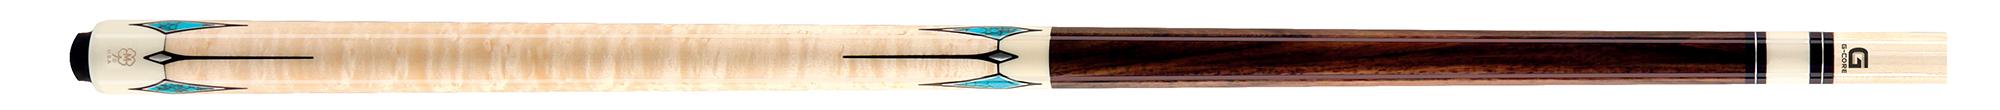 CK0962: McDermott CRM411 Rosewood/Birdseye carom #1